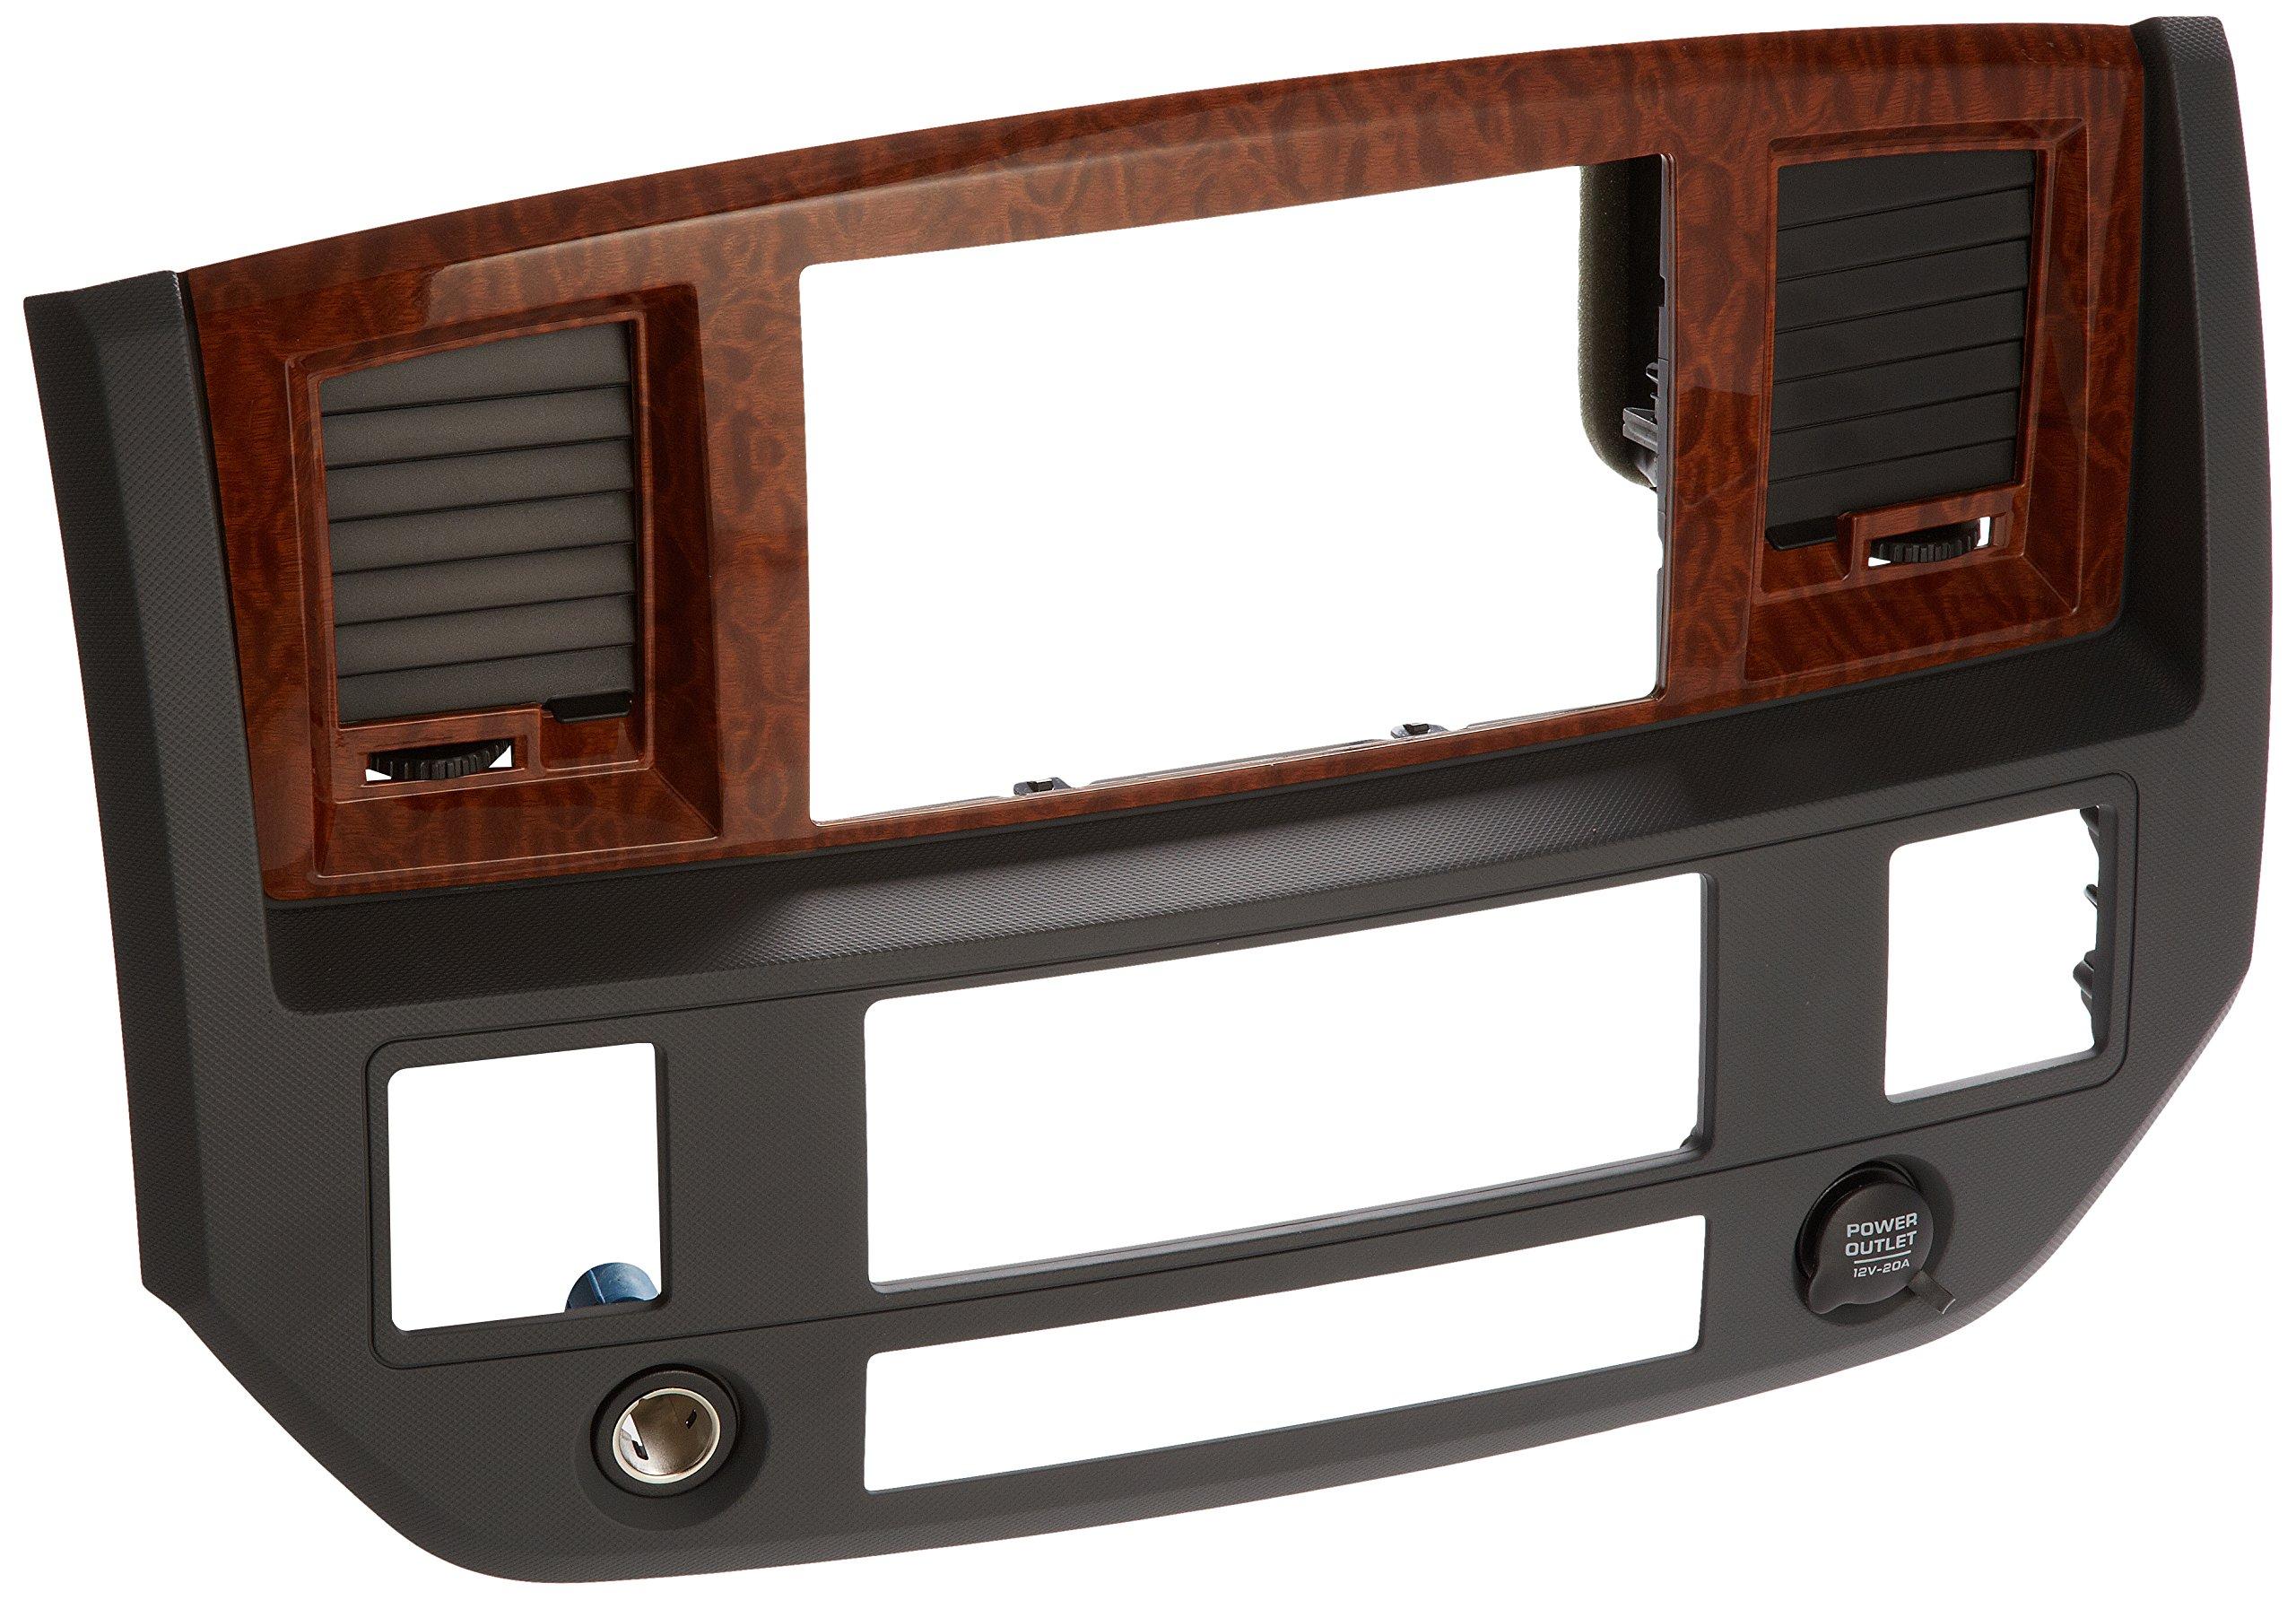 Genuine Chrysler 5JZ121DHAC Instrument Panel Bezel by Genuine Chrysler